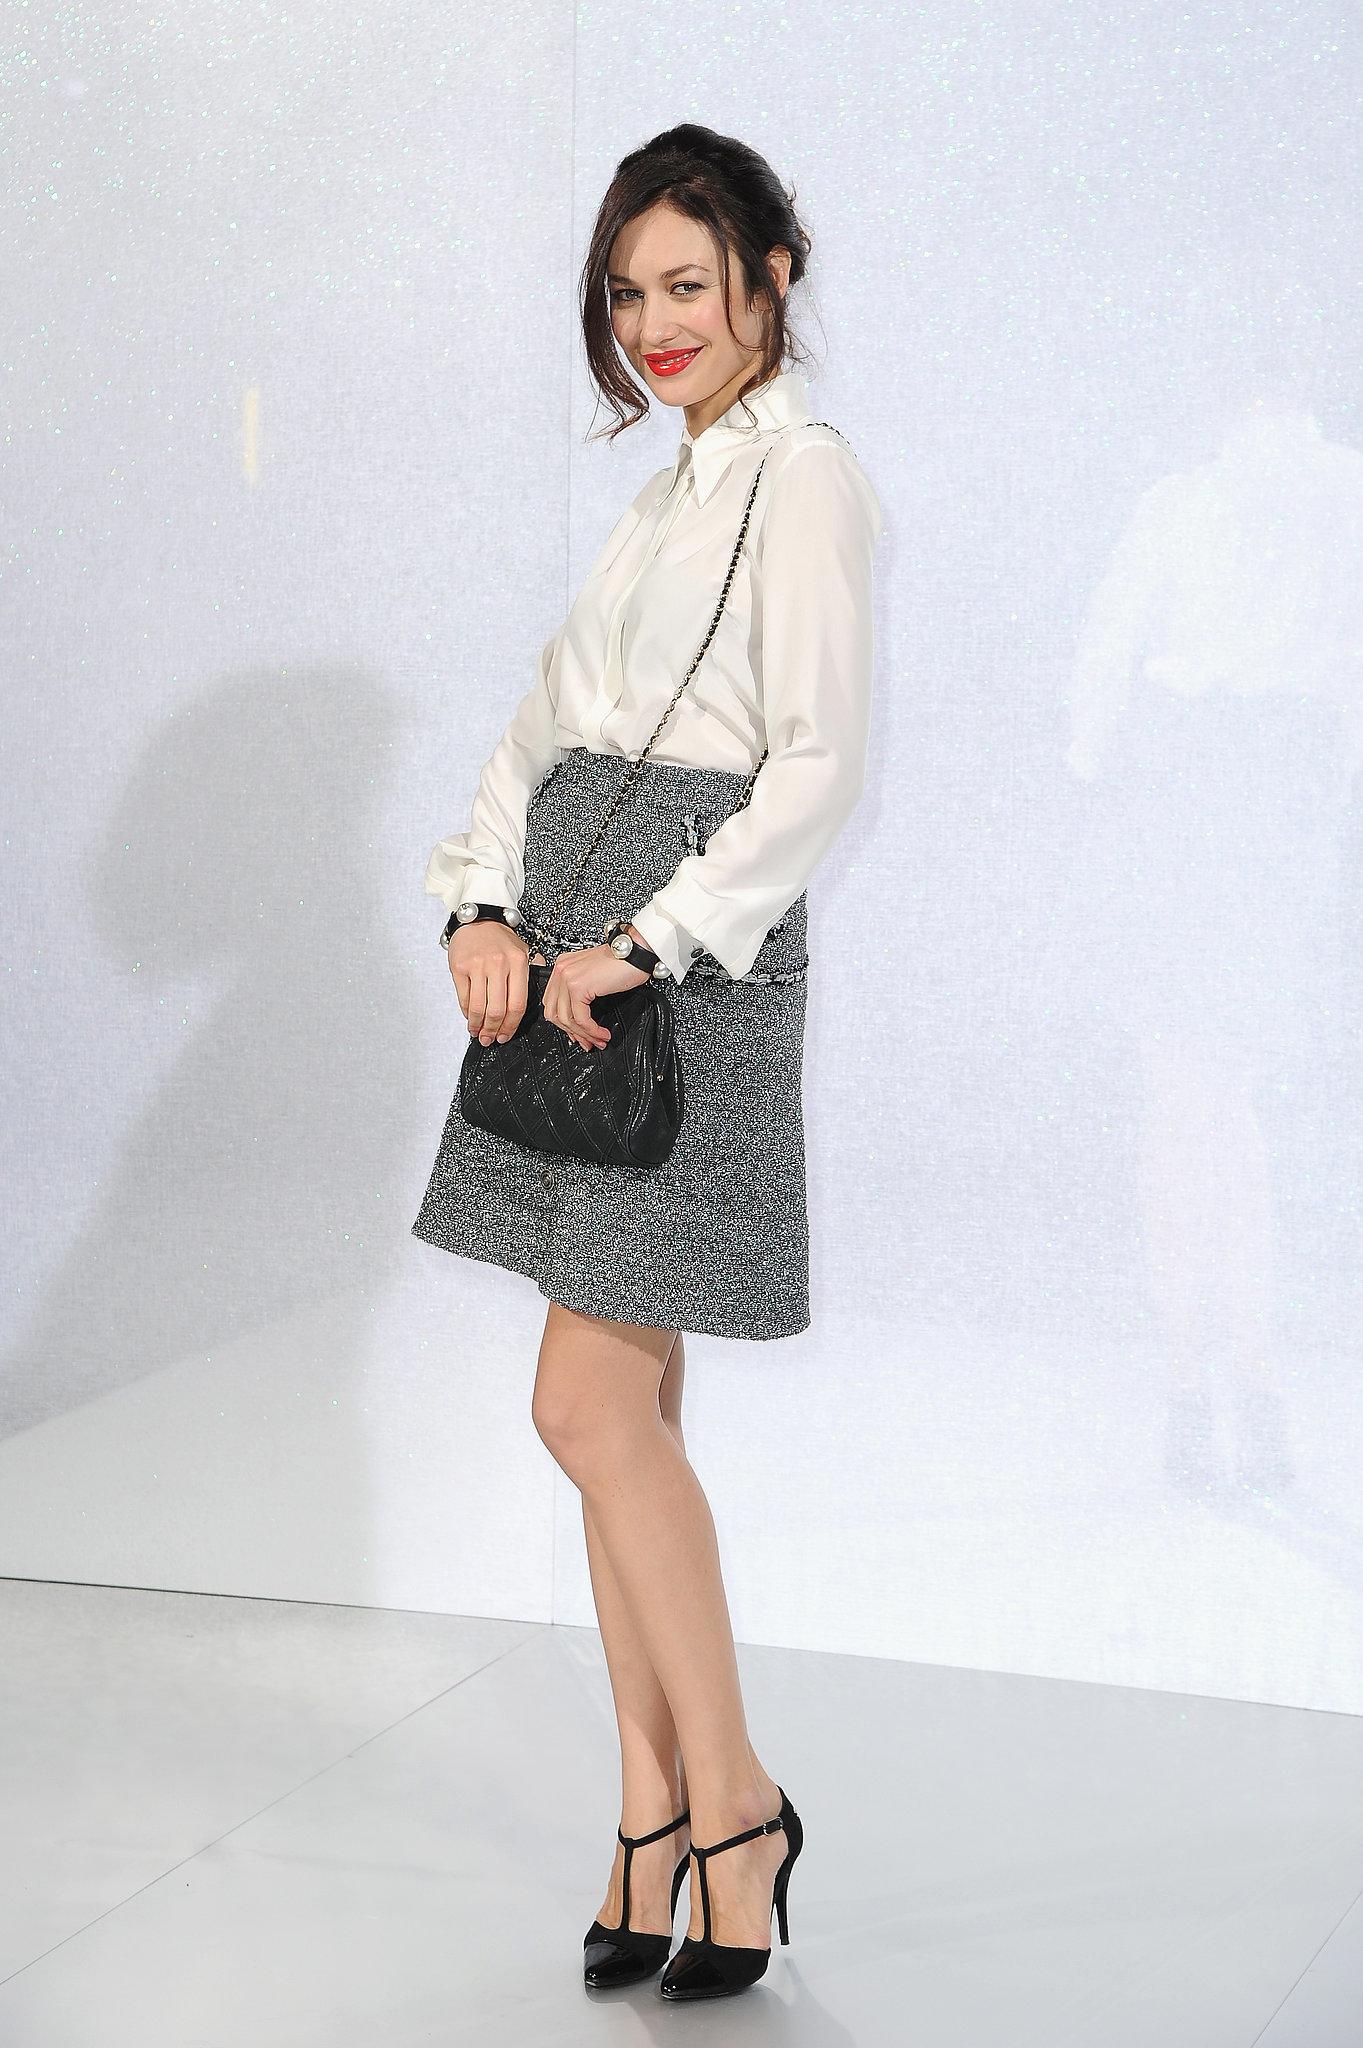 Olga Kurylenko at the Chanel Paris Haute Couture show.